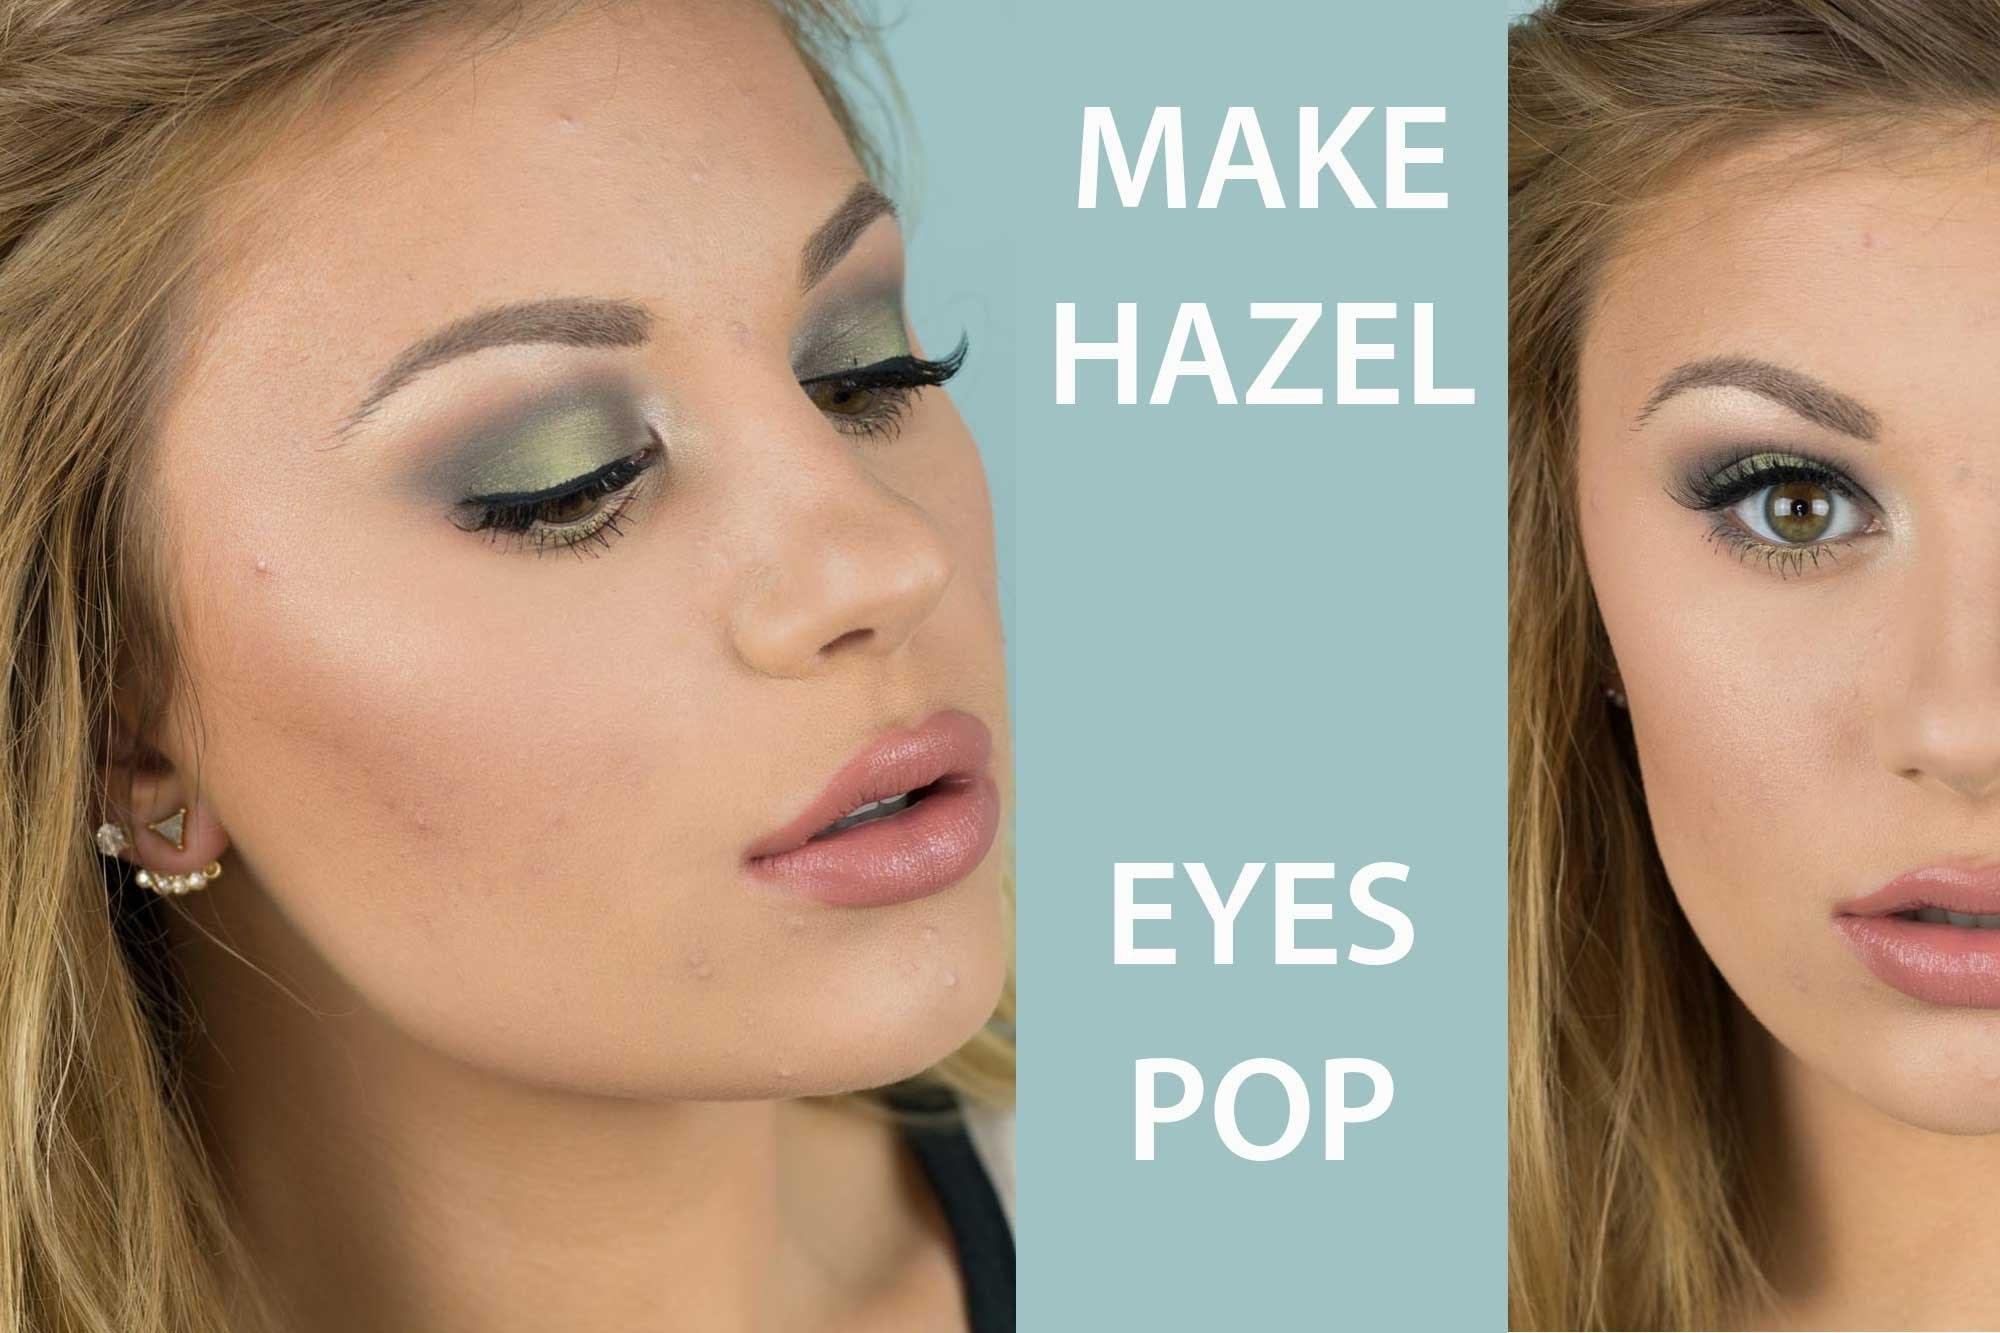 Makeup For Hazel Eyes And Blonde Hair | Saubhaya Makeup intended for Makeup For Hazel Eyes And Blonde Hair